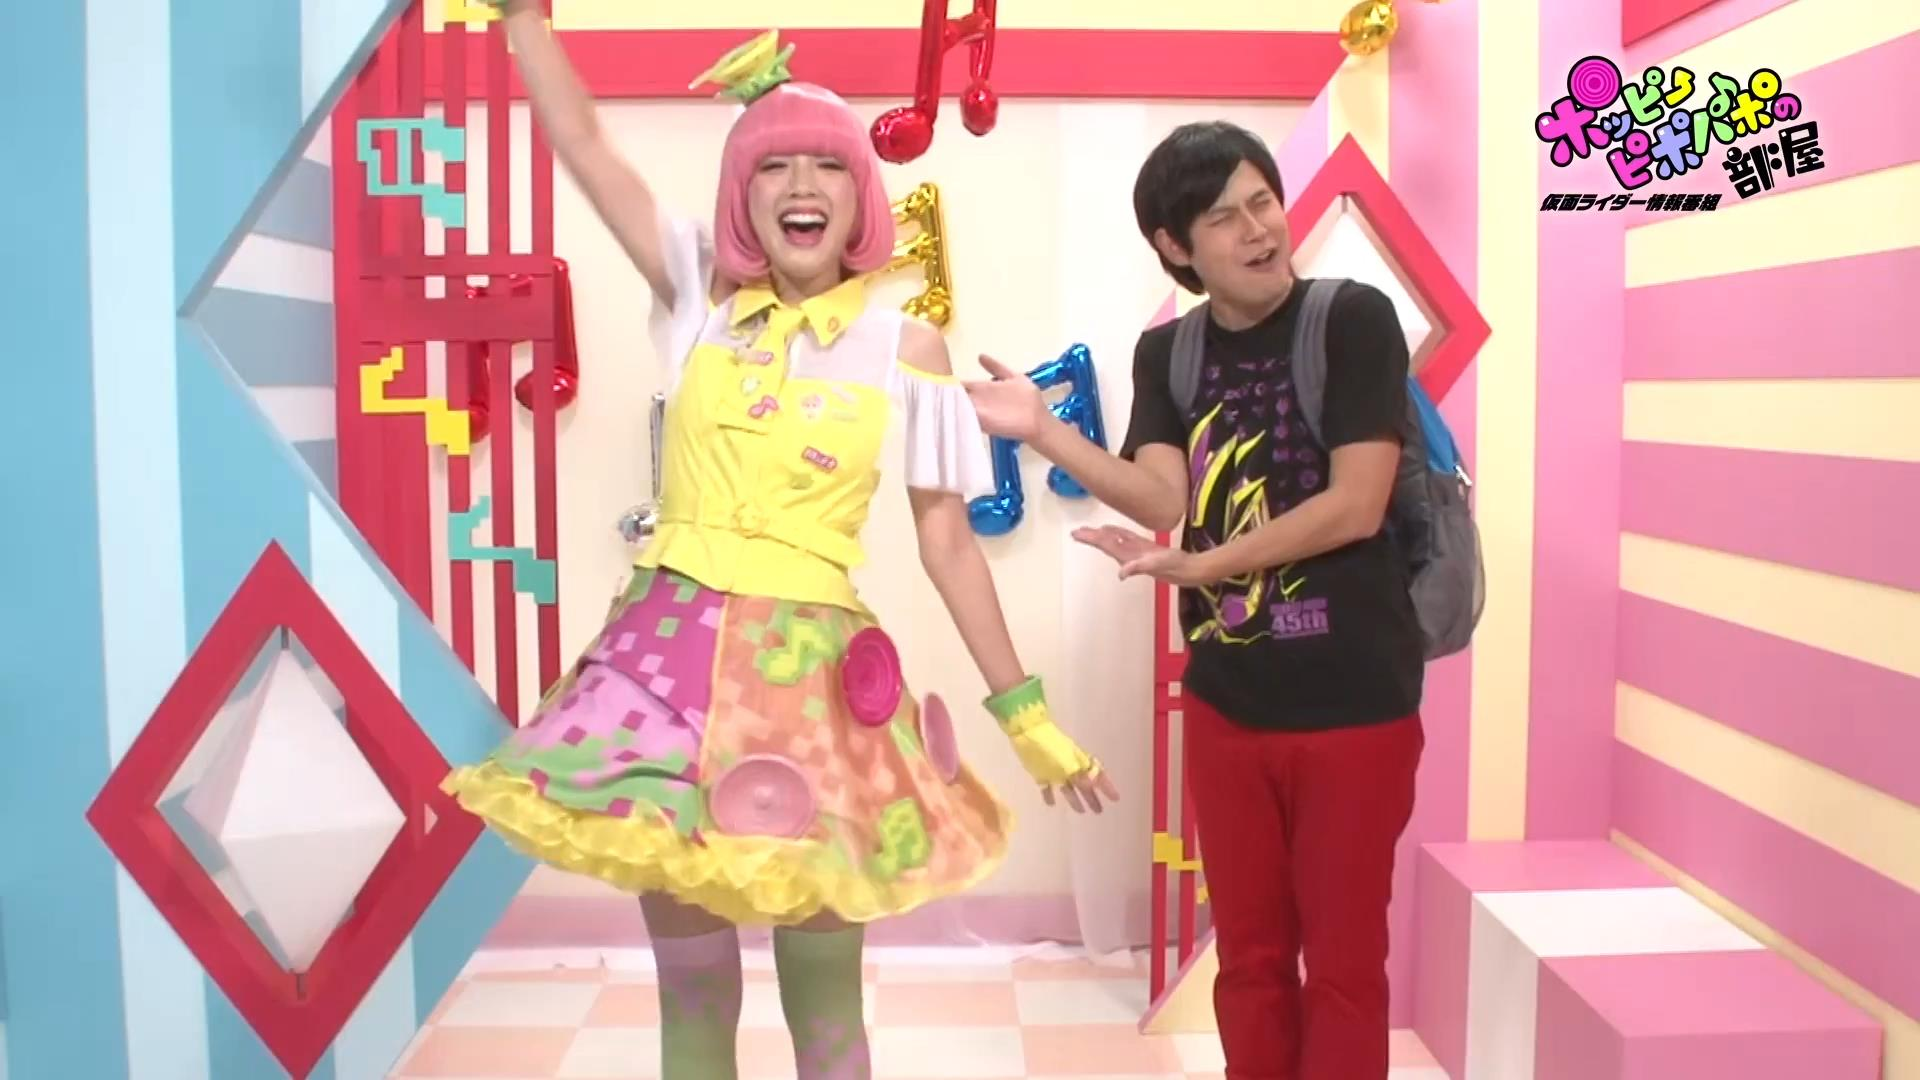 Poppy Pipopapo's Room: Episode 1 | Kamen Rider Wiki | Fandom